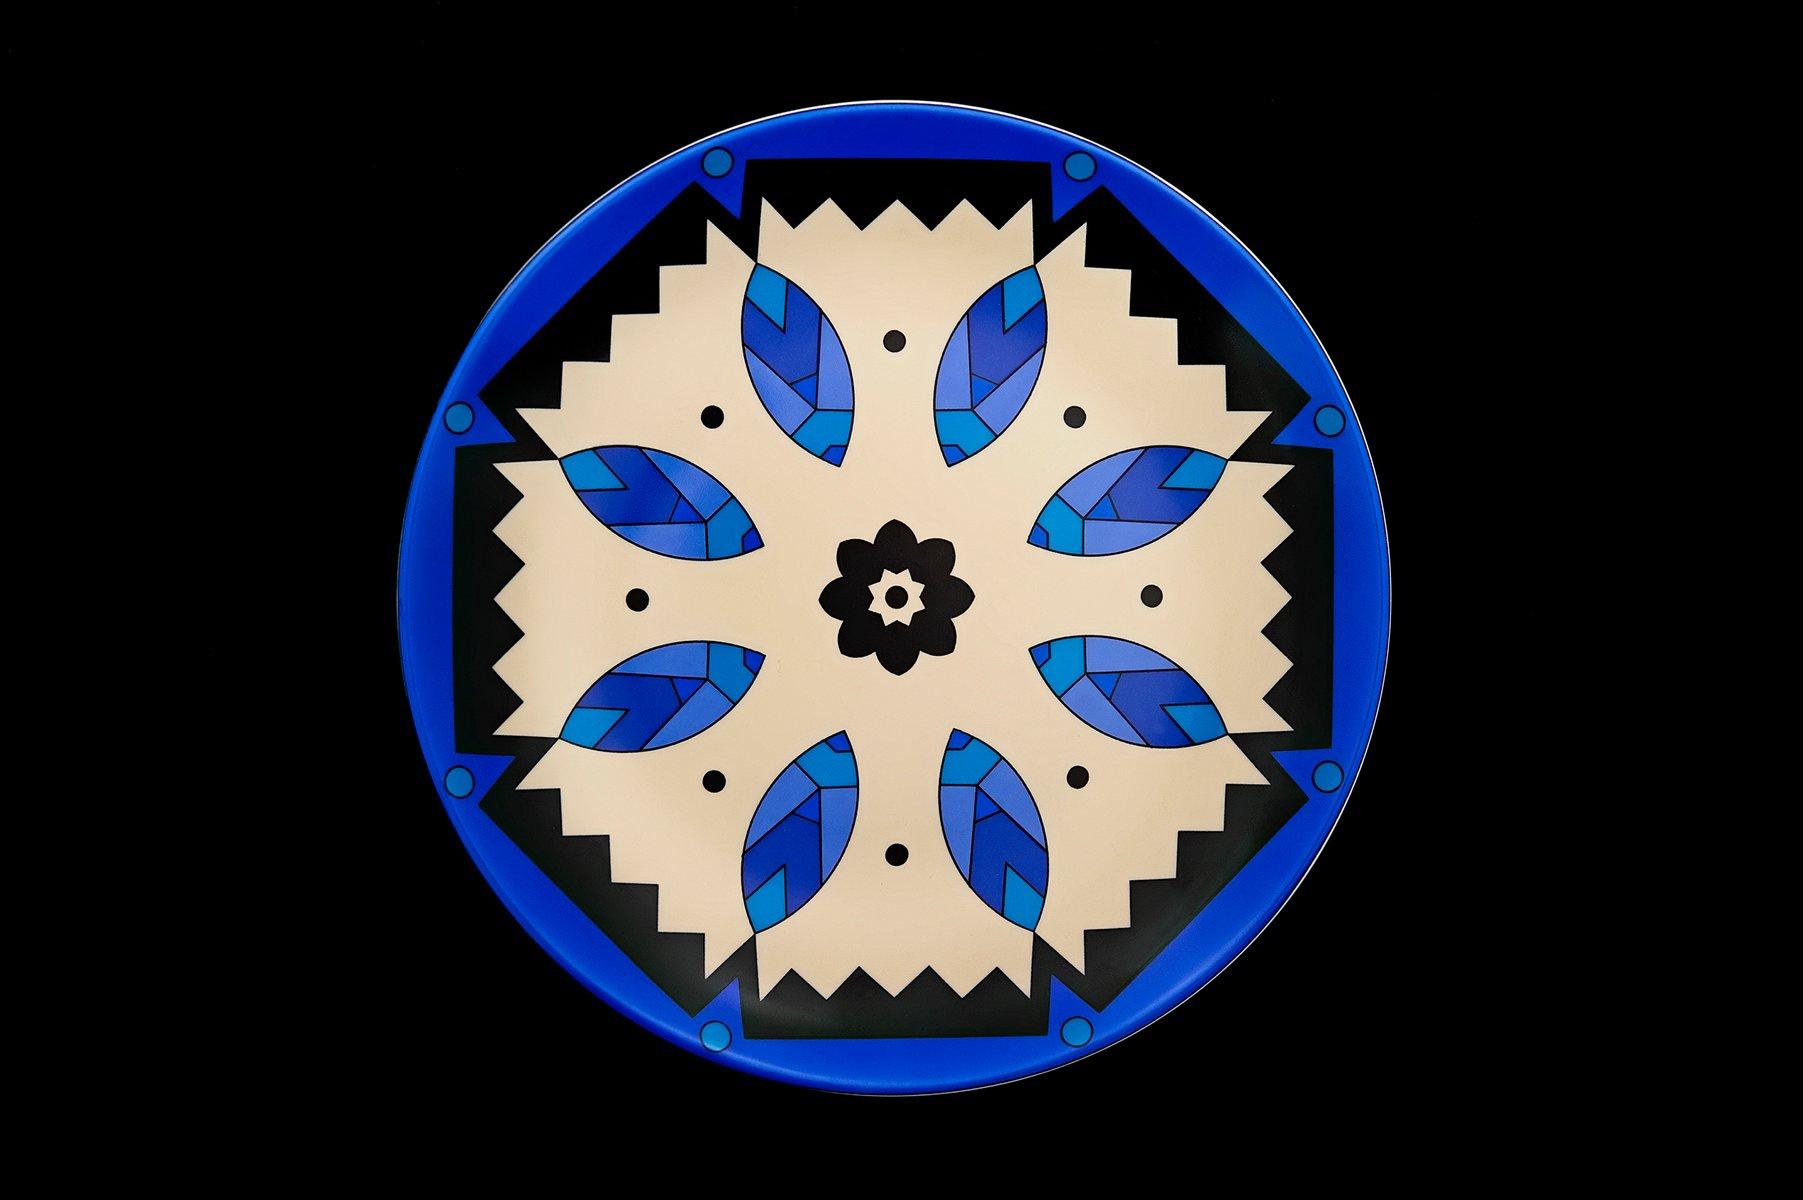 kaleidoskopische blaue porzellanteller von kostas. Black Bedroom Furniture Sets. Home Design Ideas